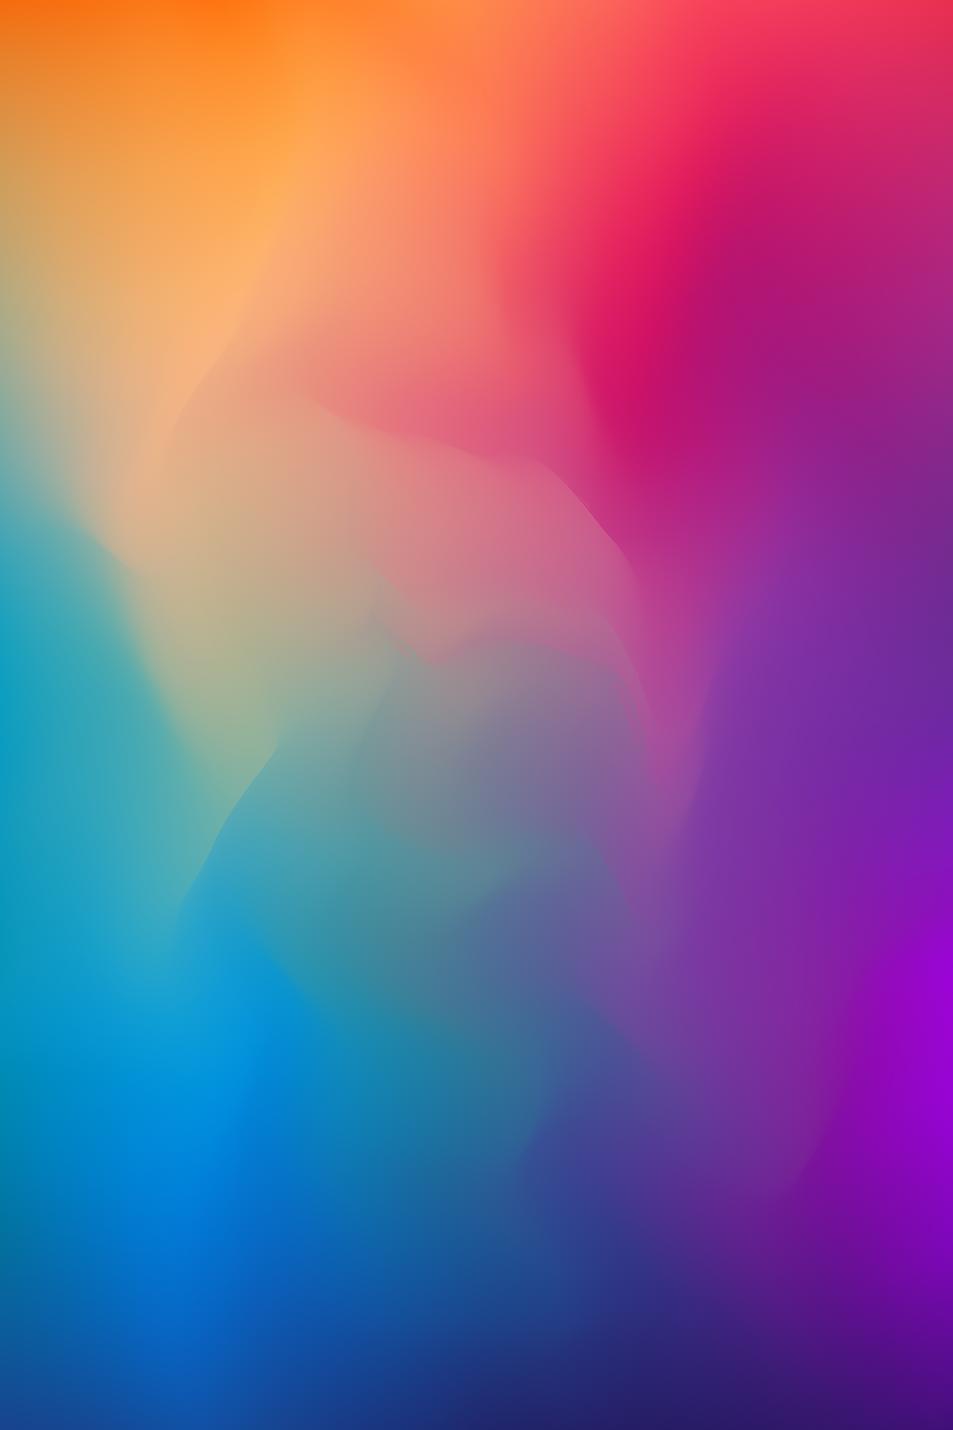 Background Image_Compressed_Portraiot.pn